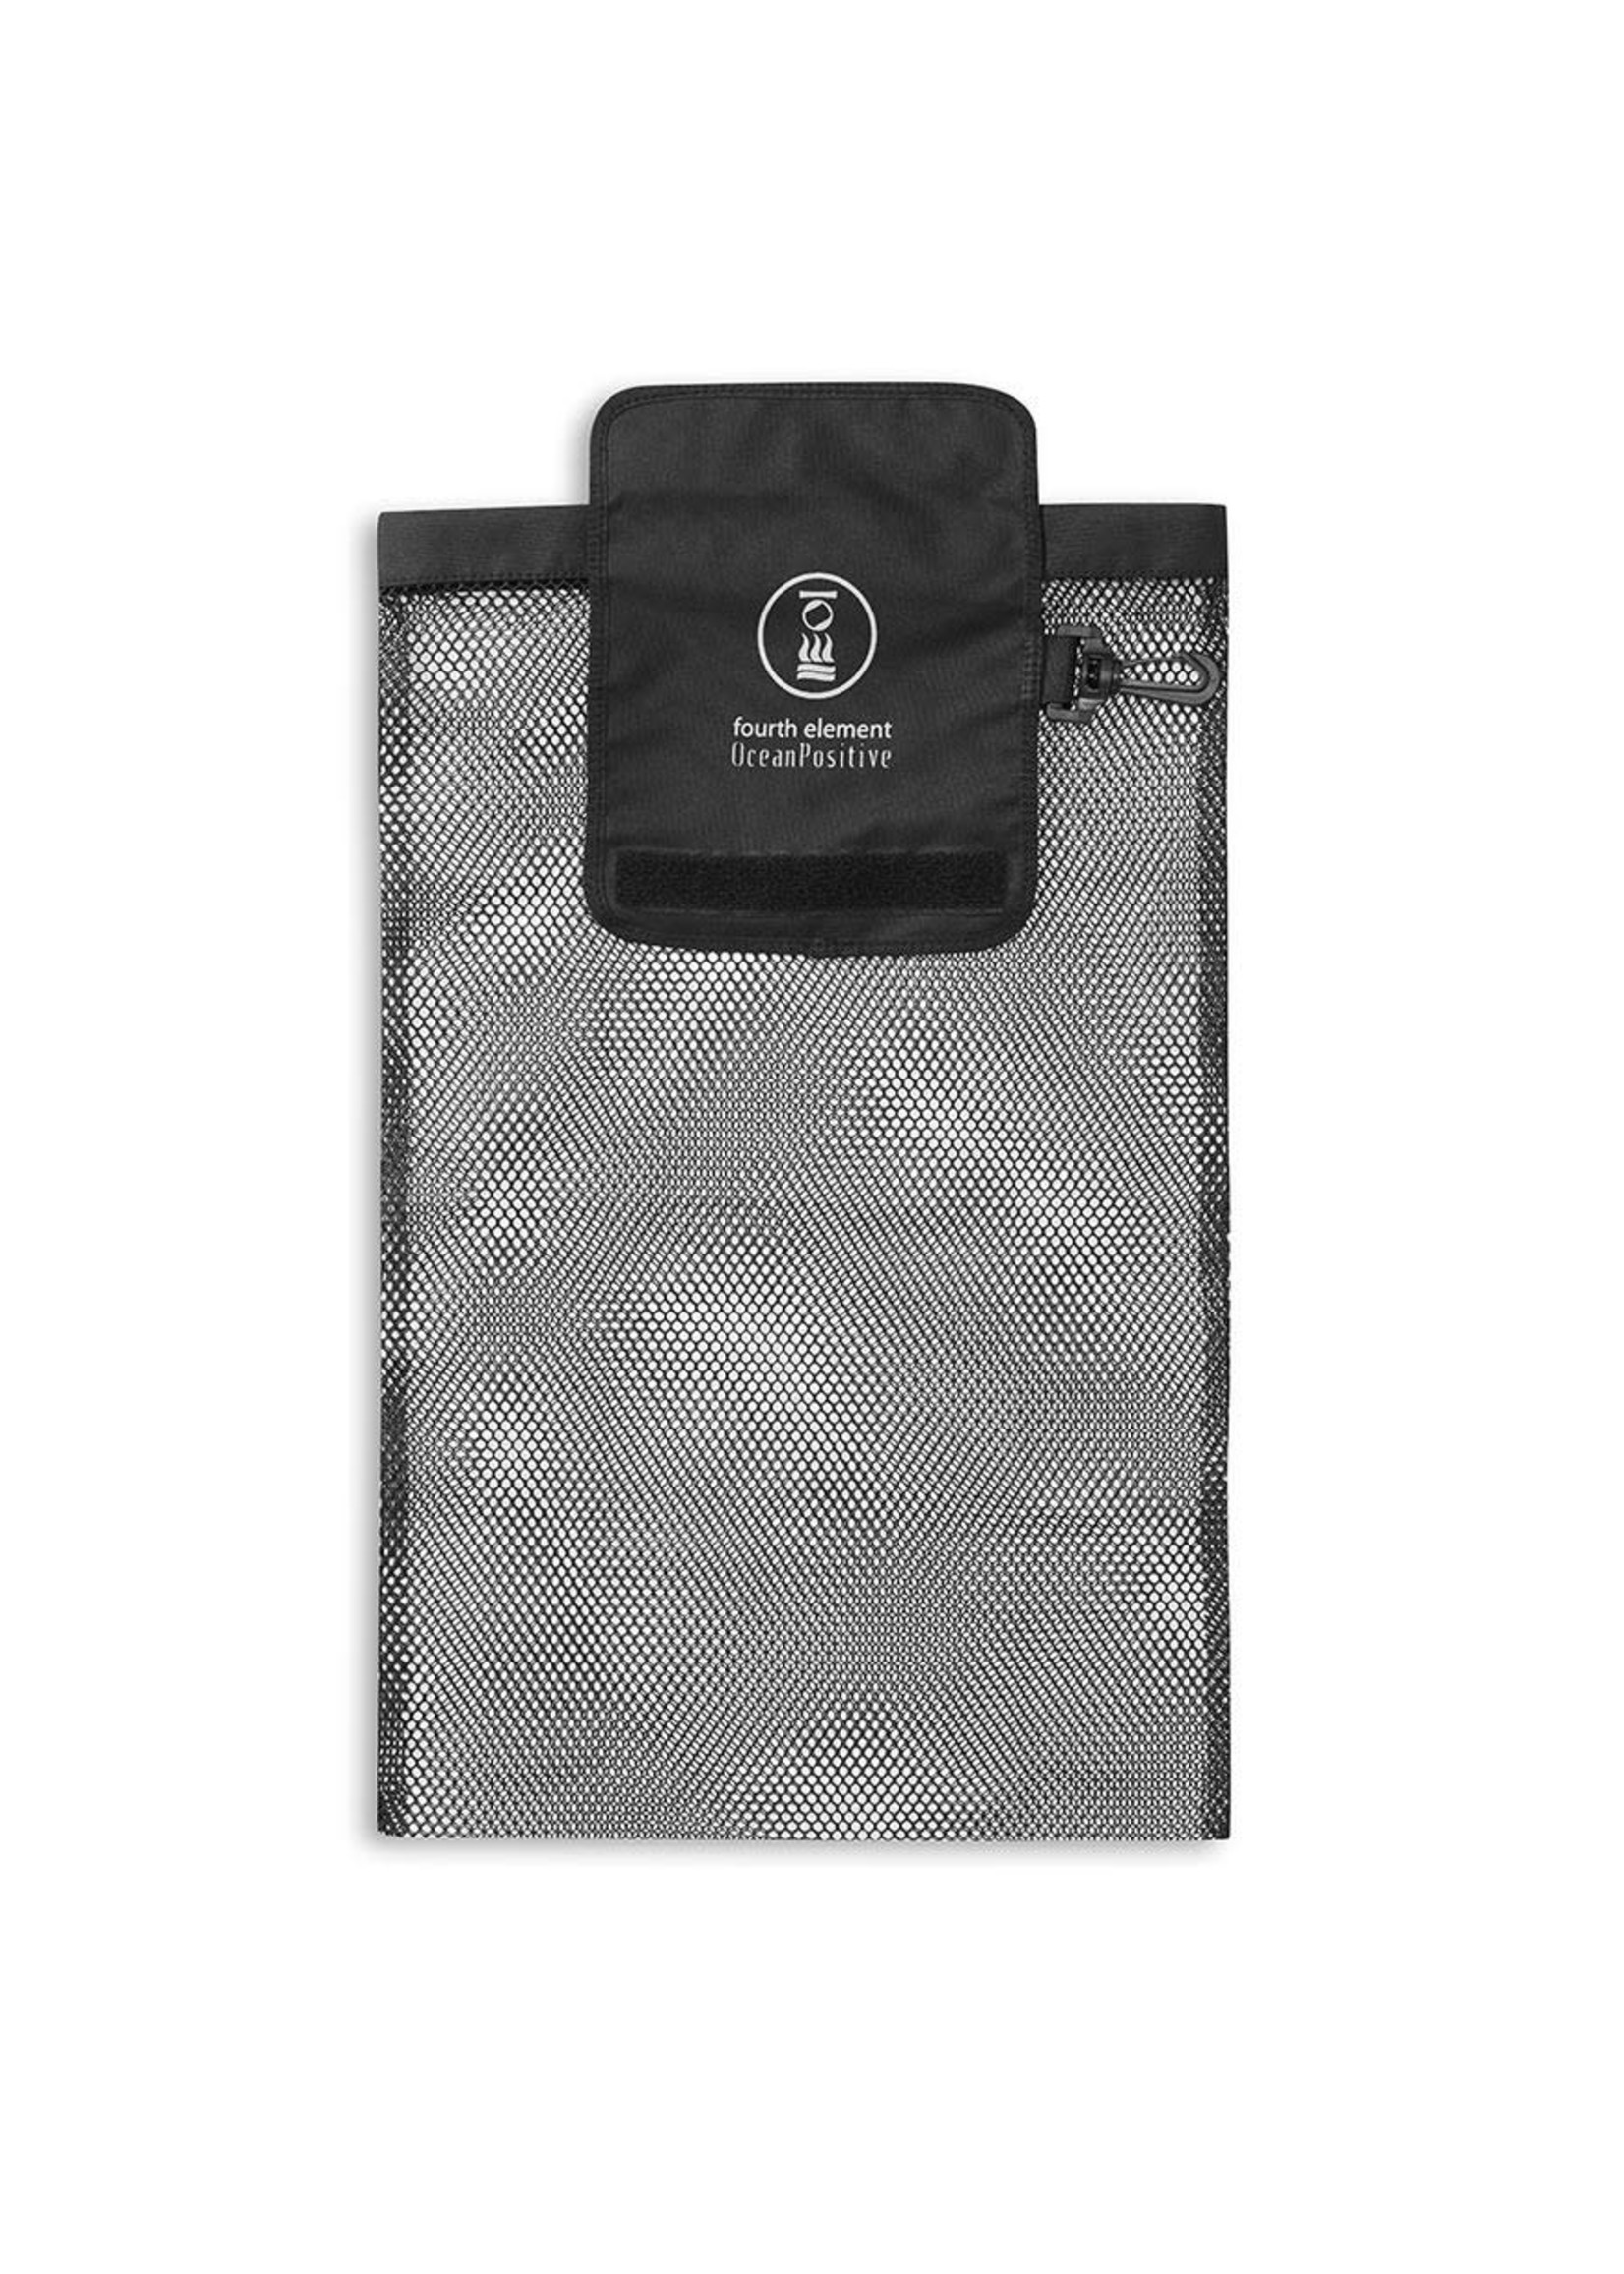 Fourth Element Fourth Element Ocean Debris Bag